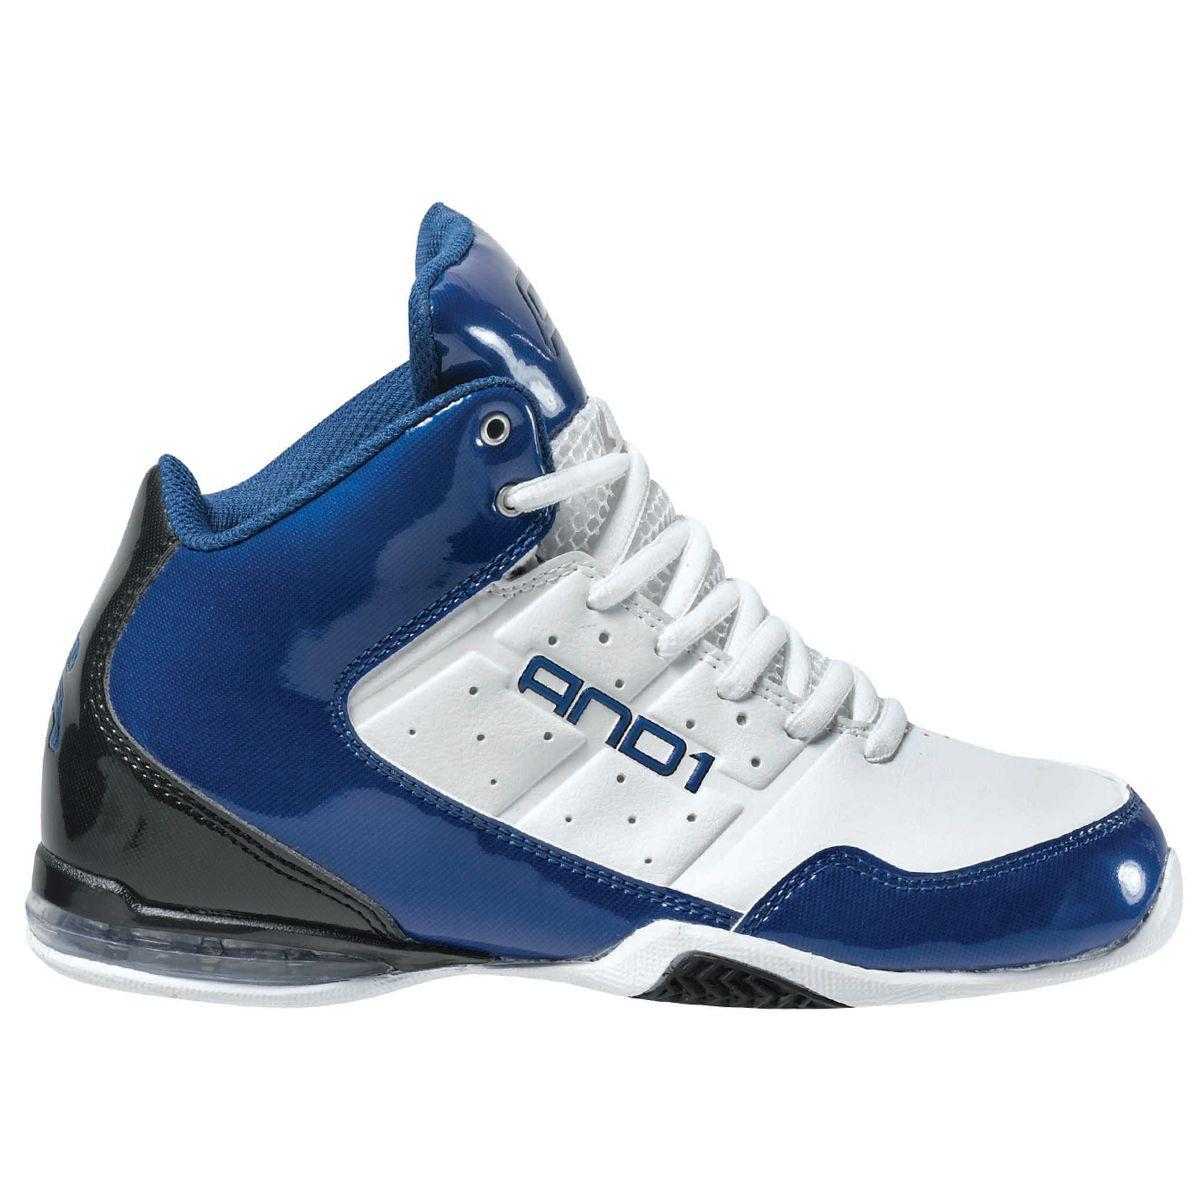 8ba87334c756 AND1 Master Mid Basketball Shoe